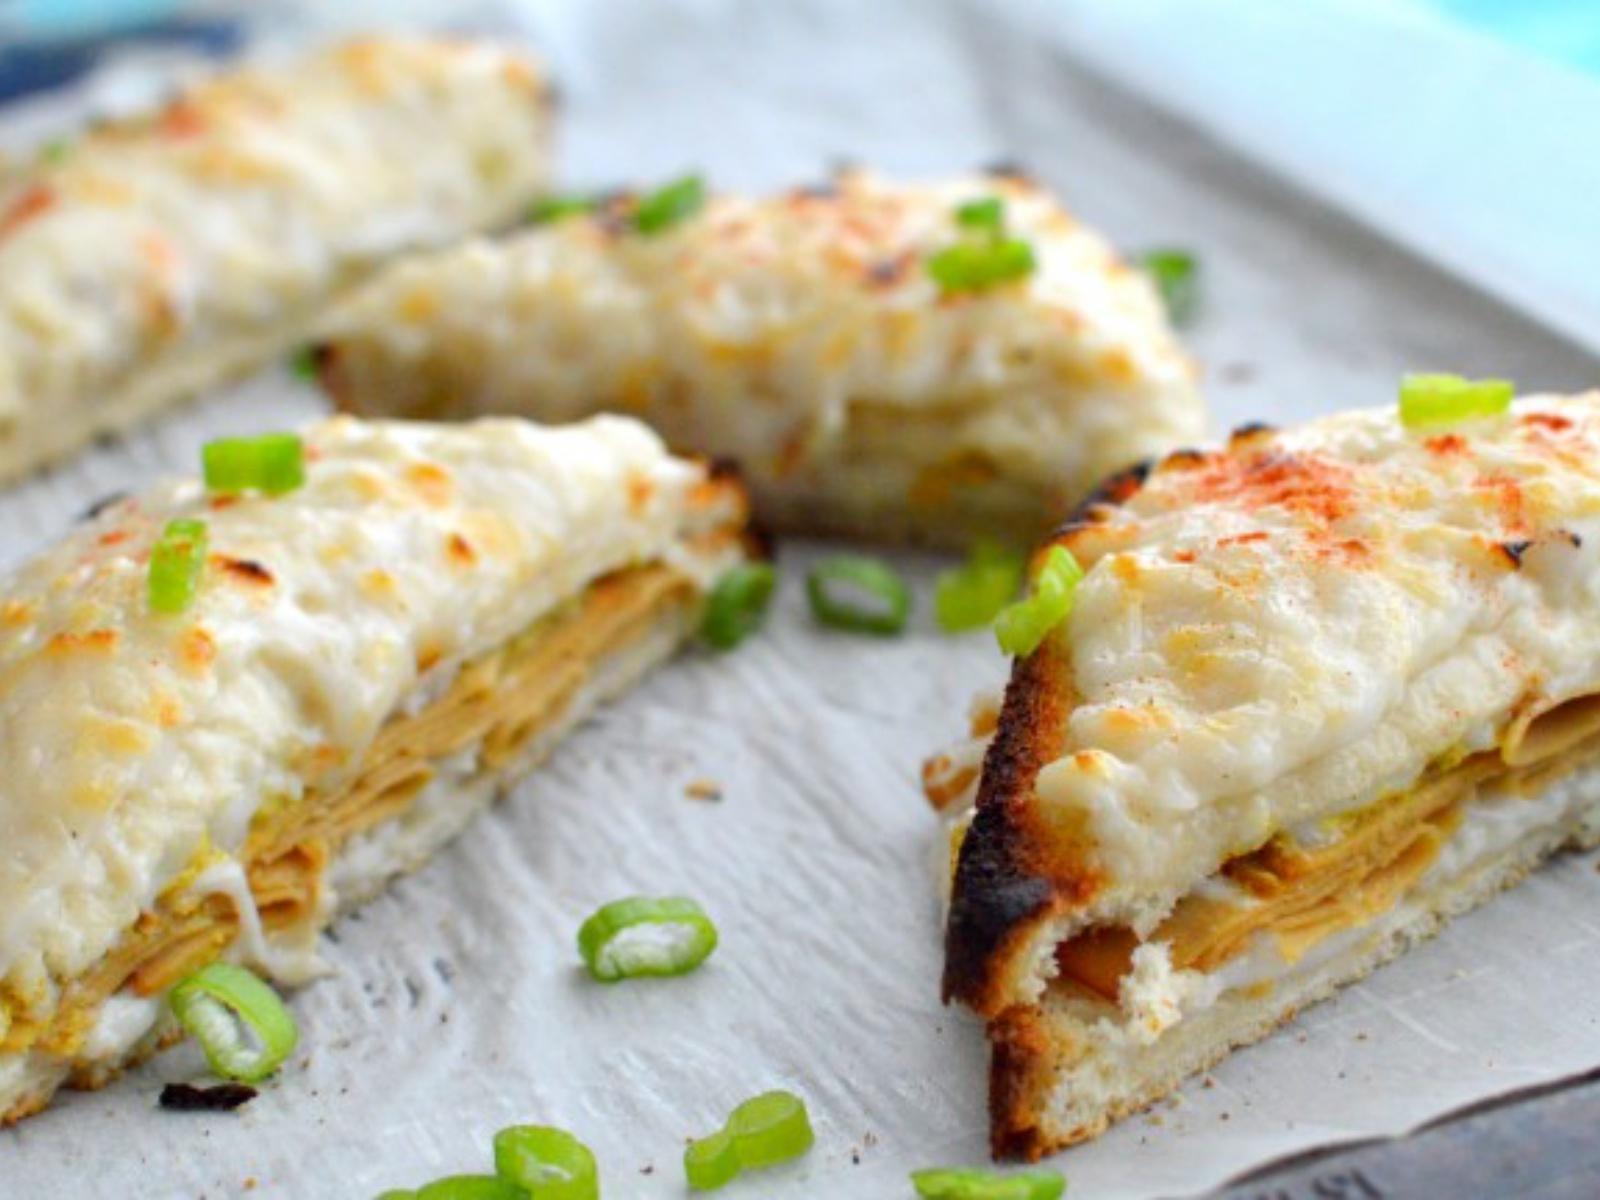 Vegan Croque Monsieur with vegan cheese, deli slices and bechamel sauce